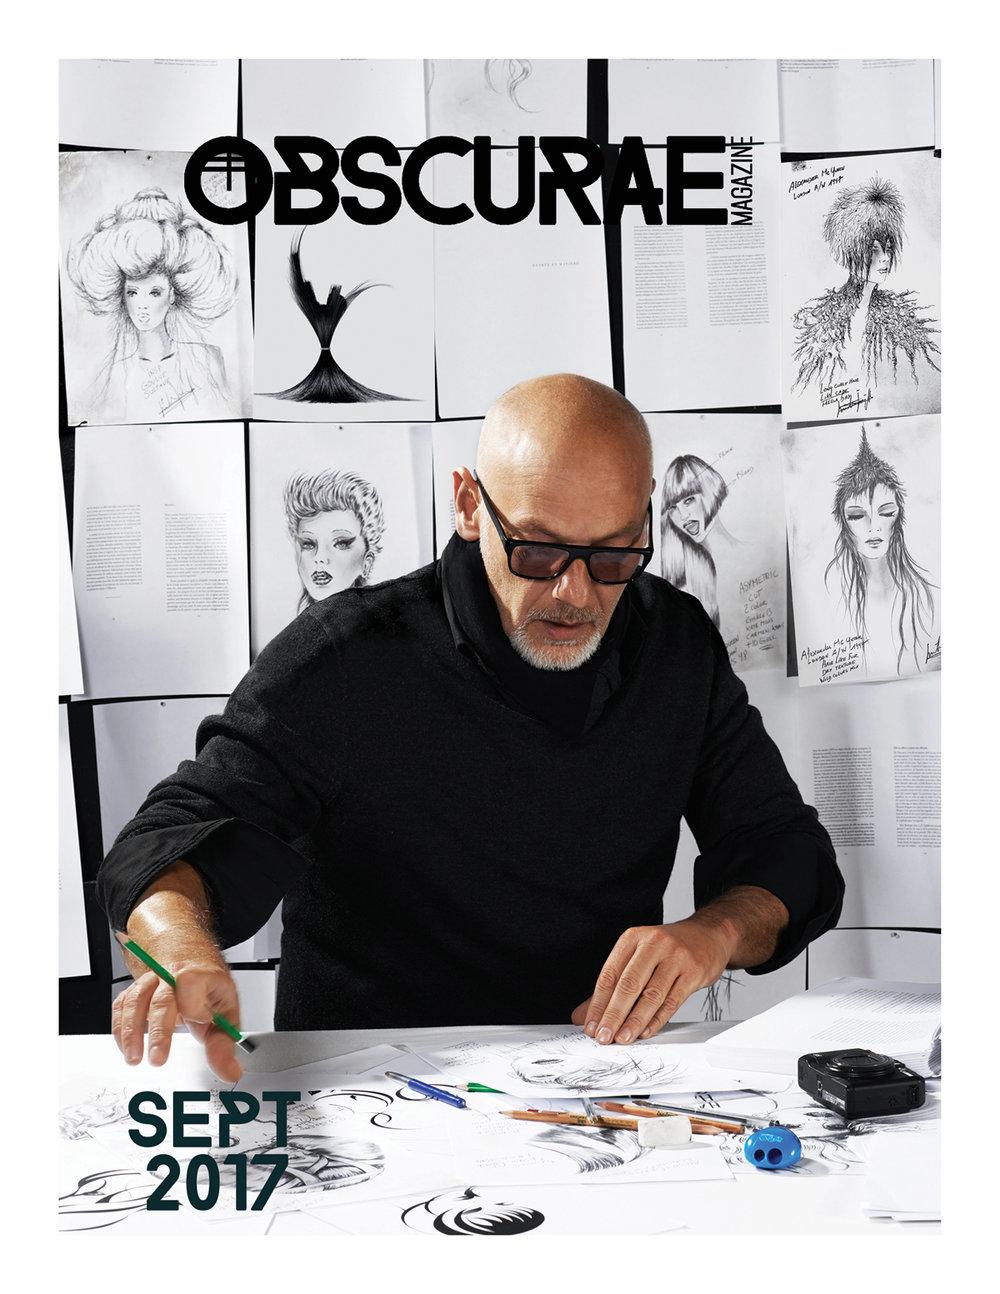 Nicolas-jurnjack-obscurae-interview.jpg